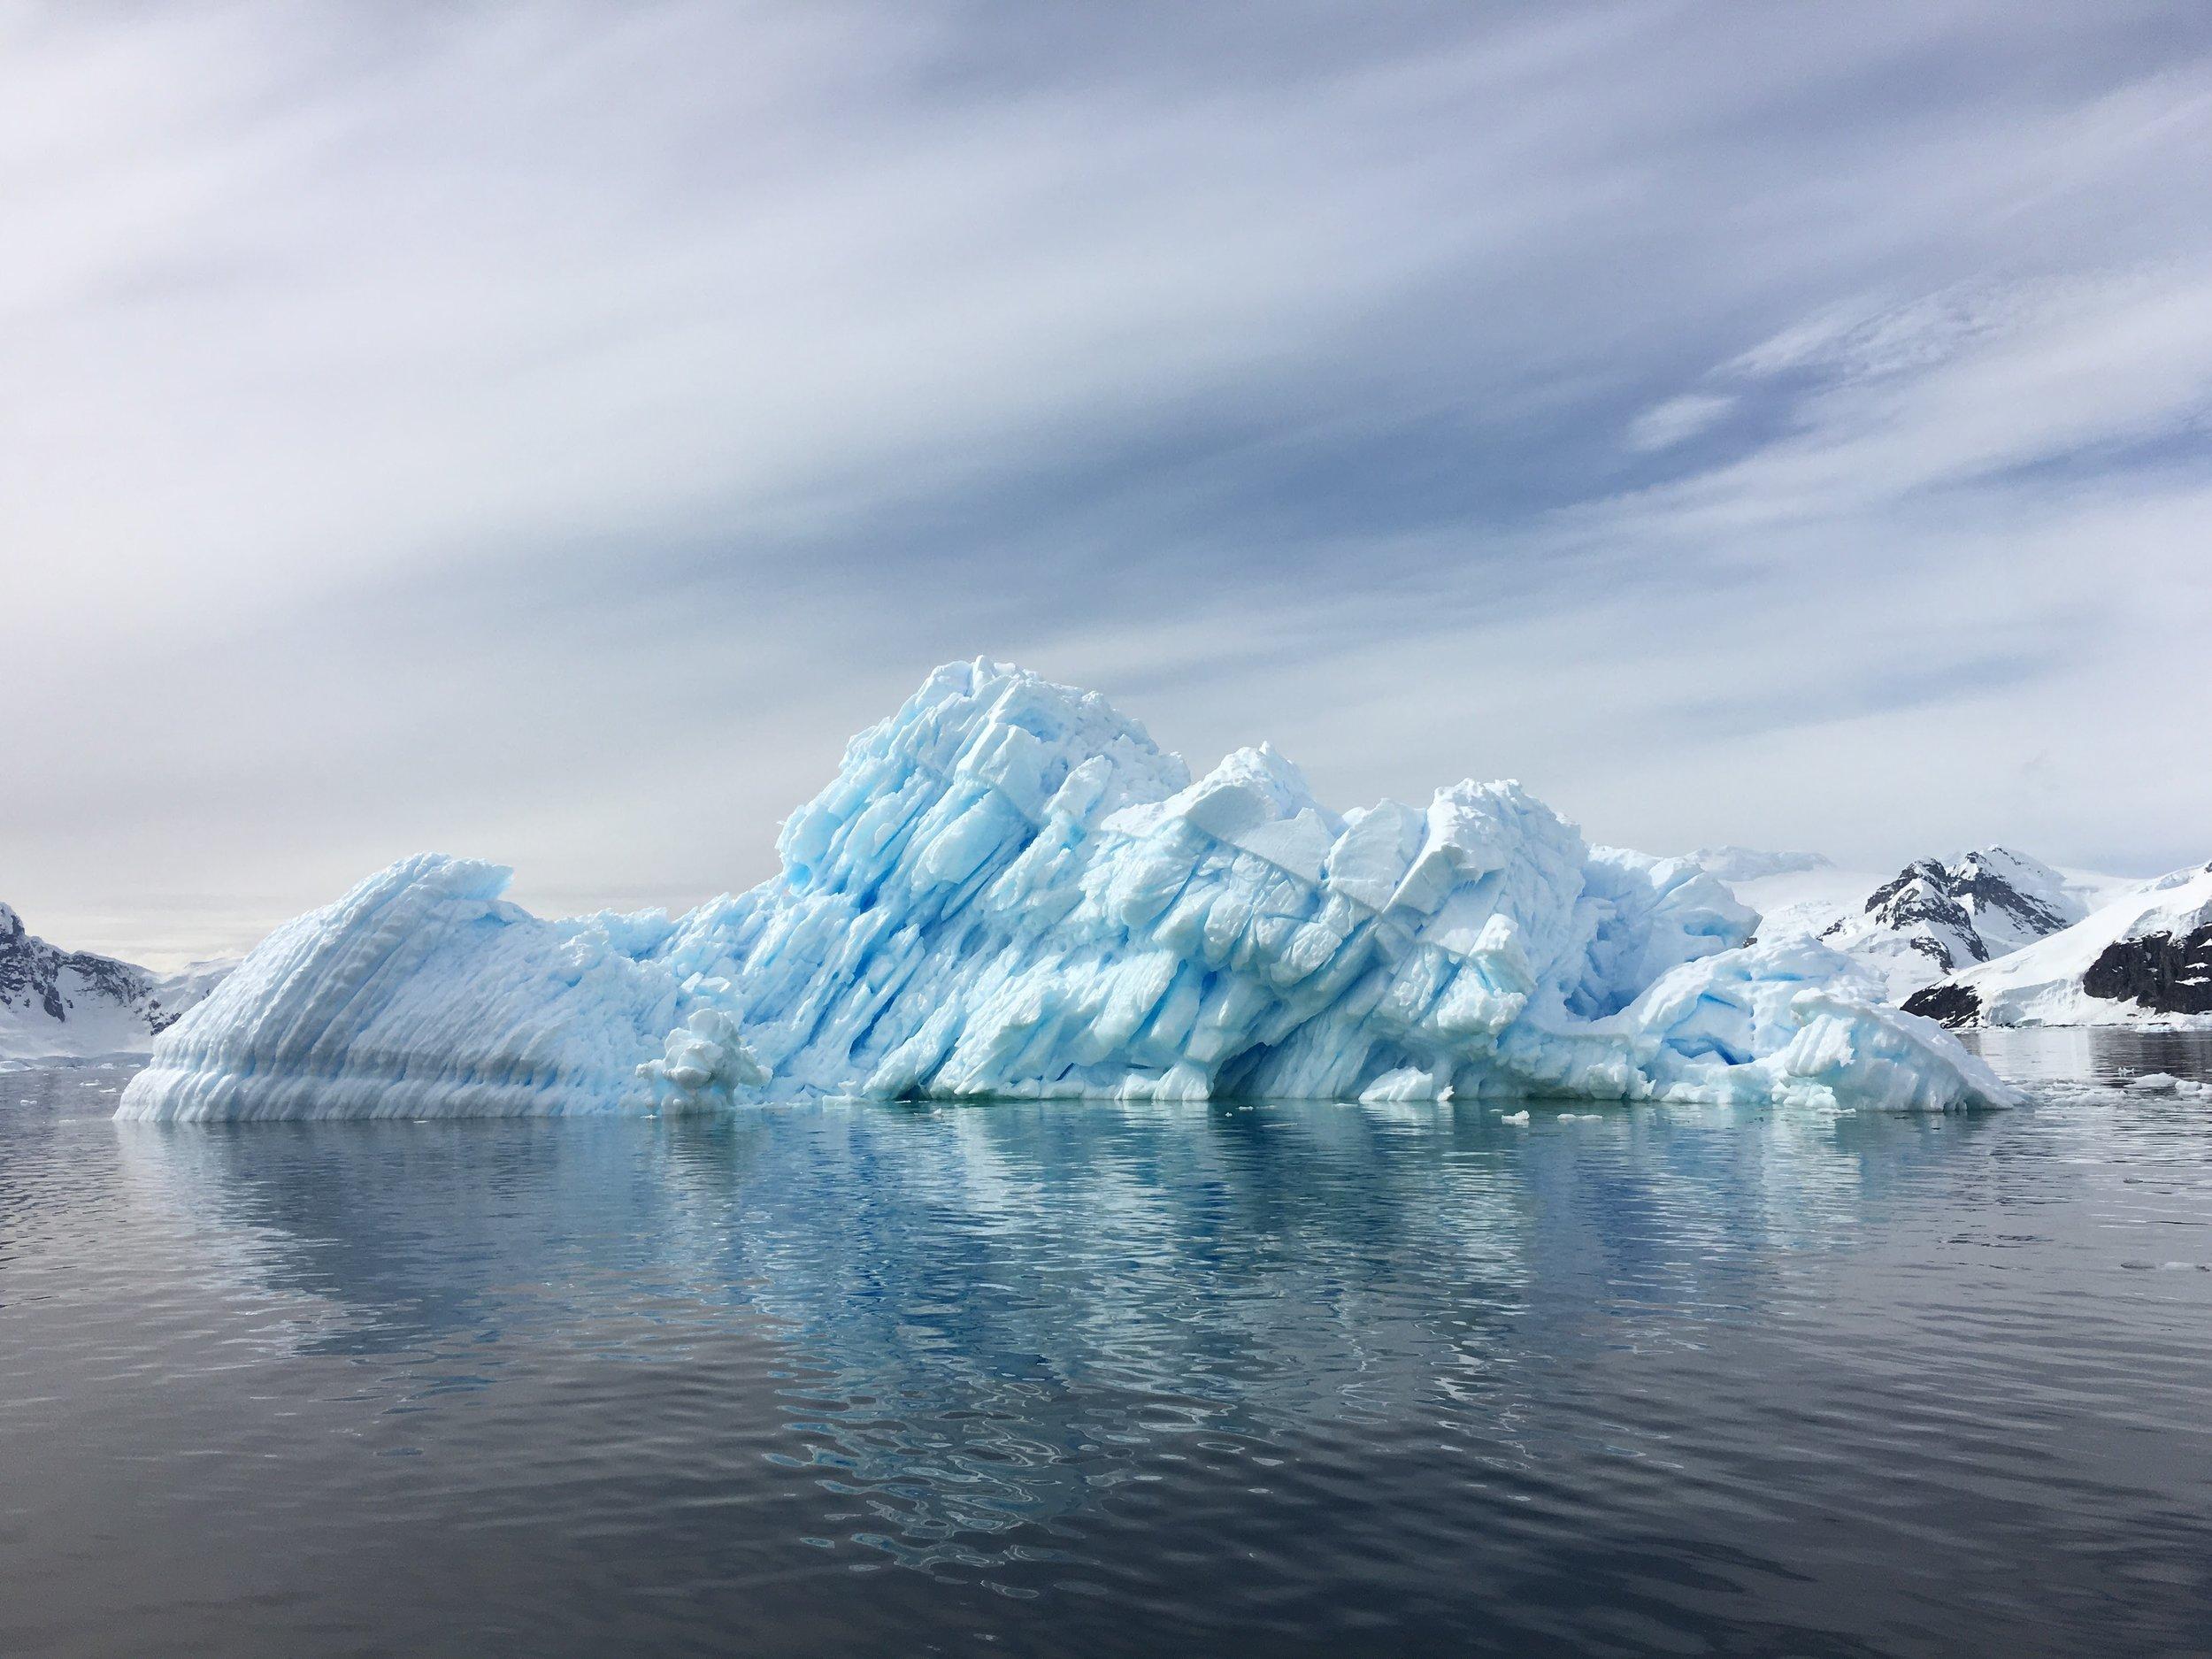 Luxury Expedition to Antarctica - Abercrombie & Kent luxury expedition tour on the all-balcony Le Lyrial ship